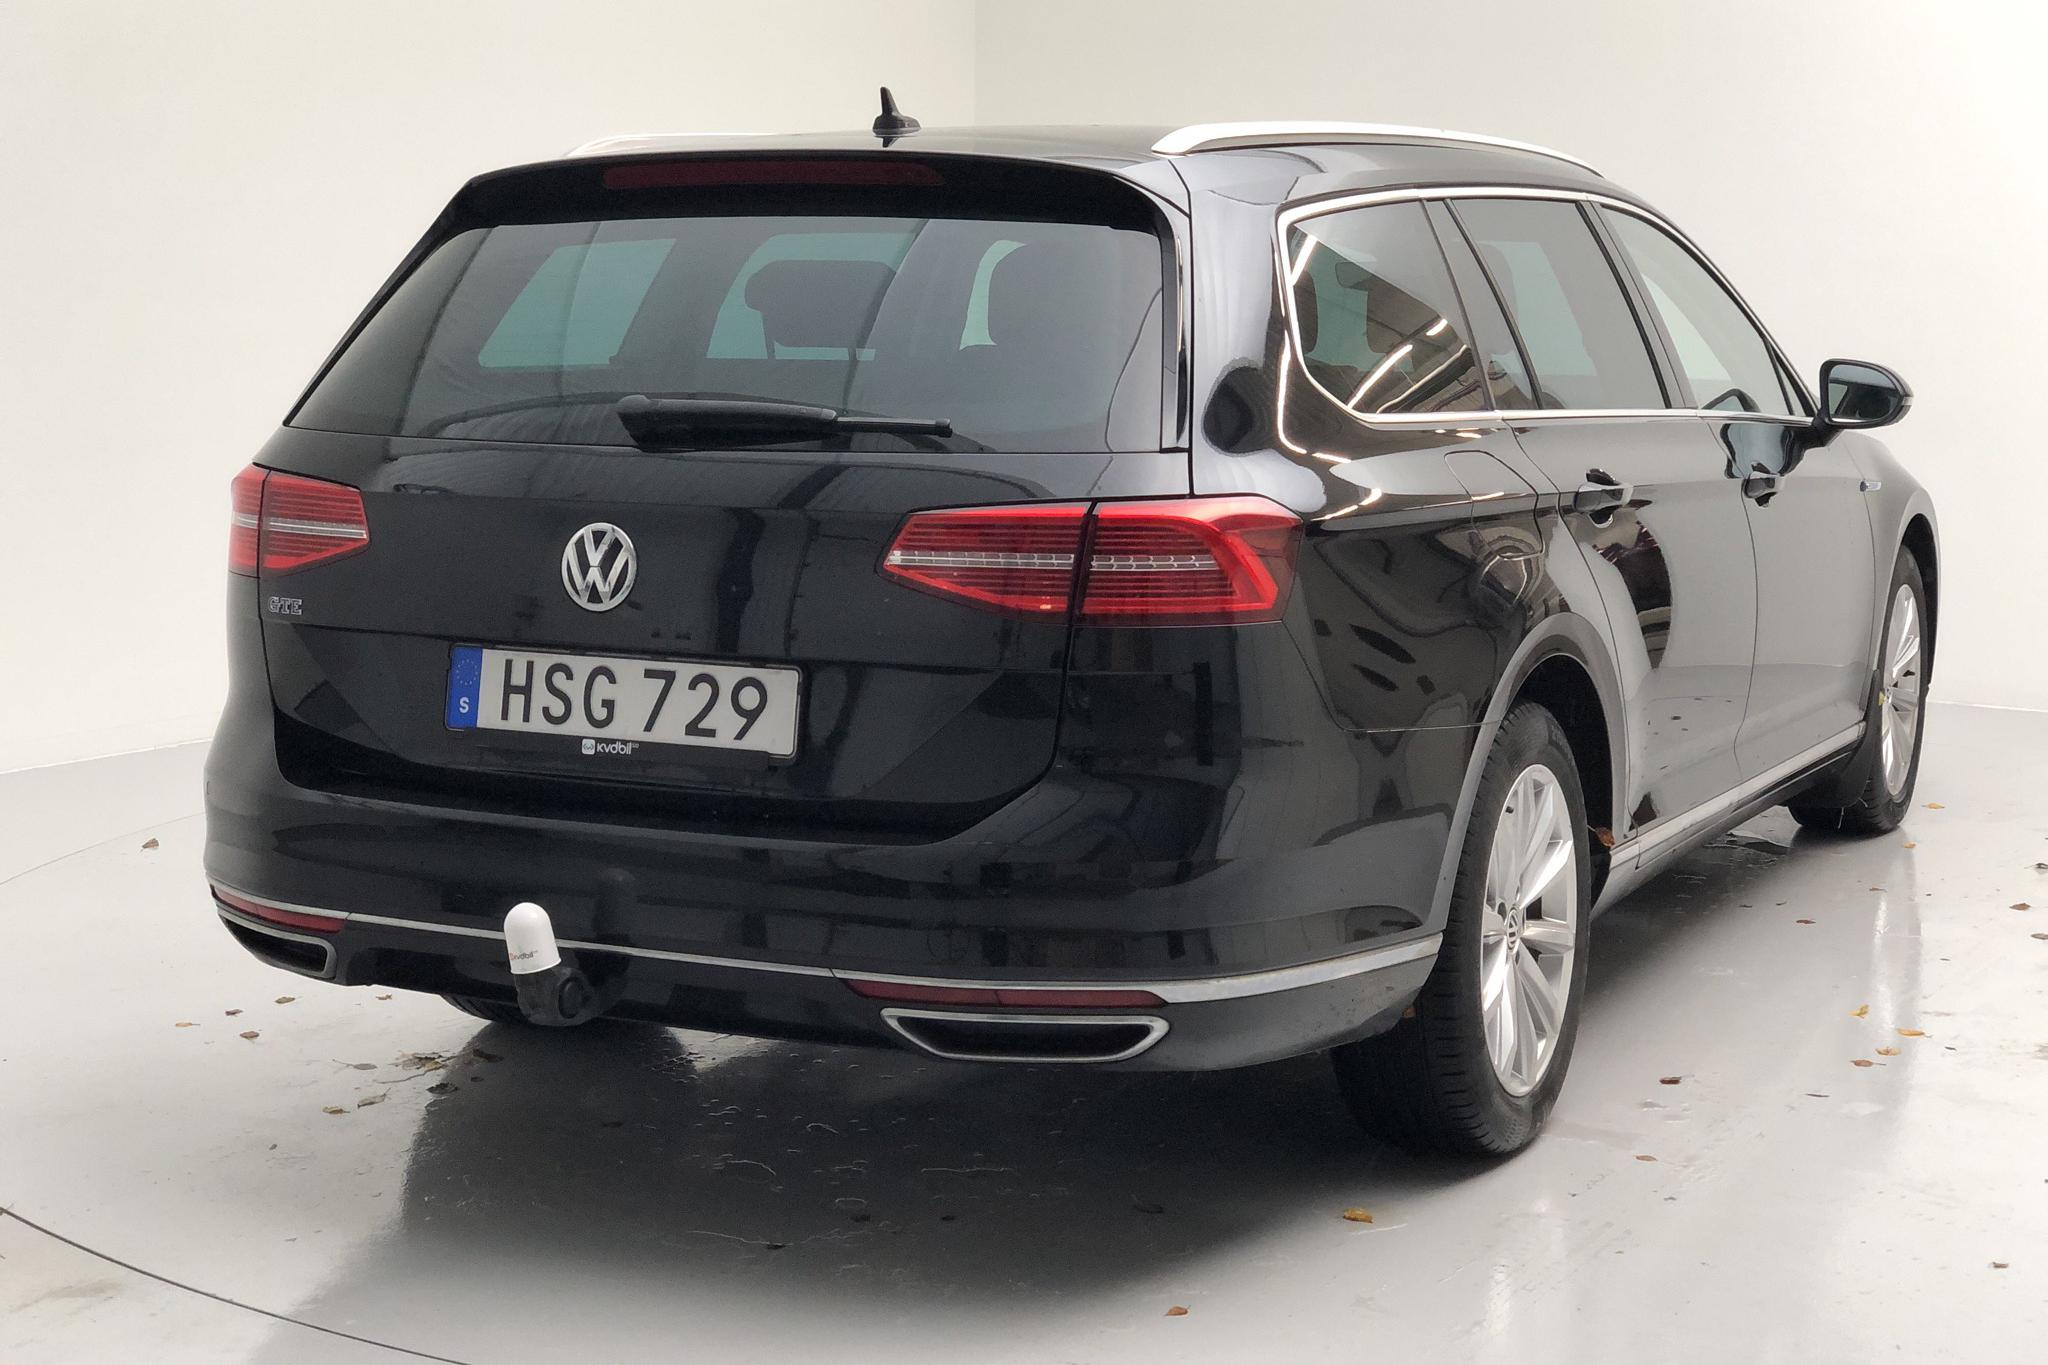 VW Passat 1.4 Plug-in-Hybrid Sportscombi (218hk) - 10 499 mil - Automat - svart - 2017